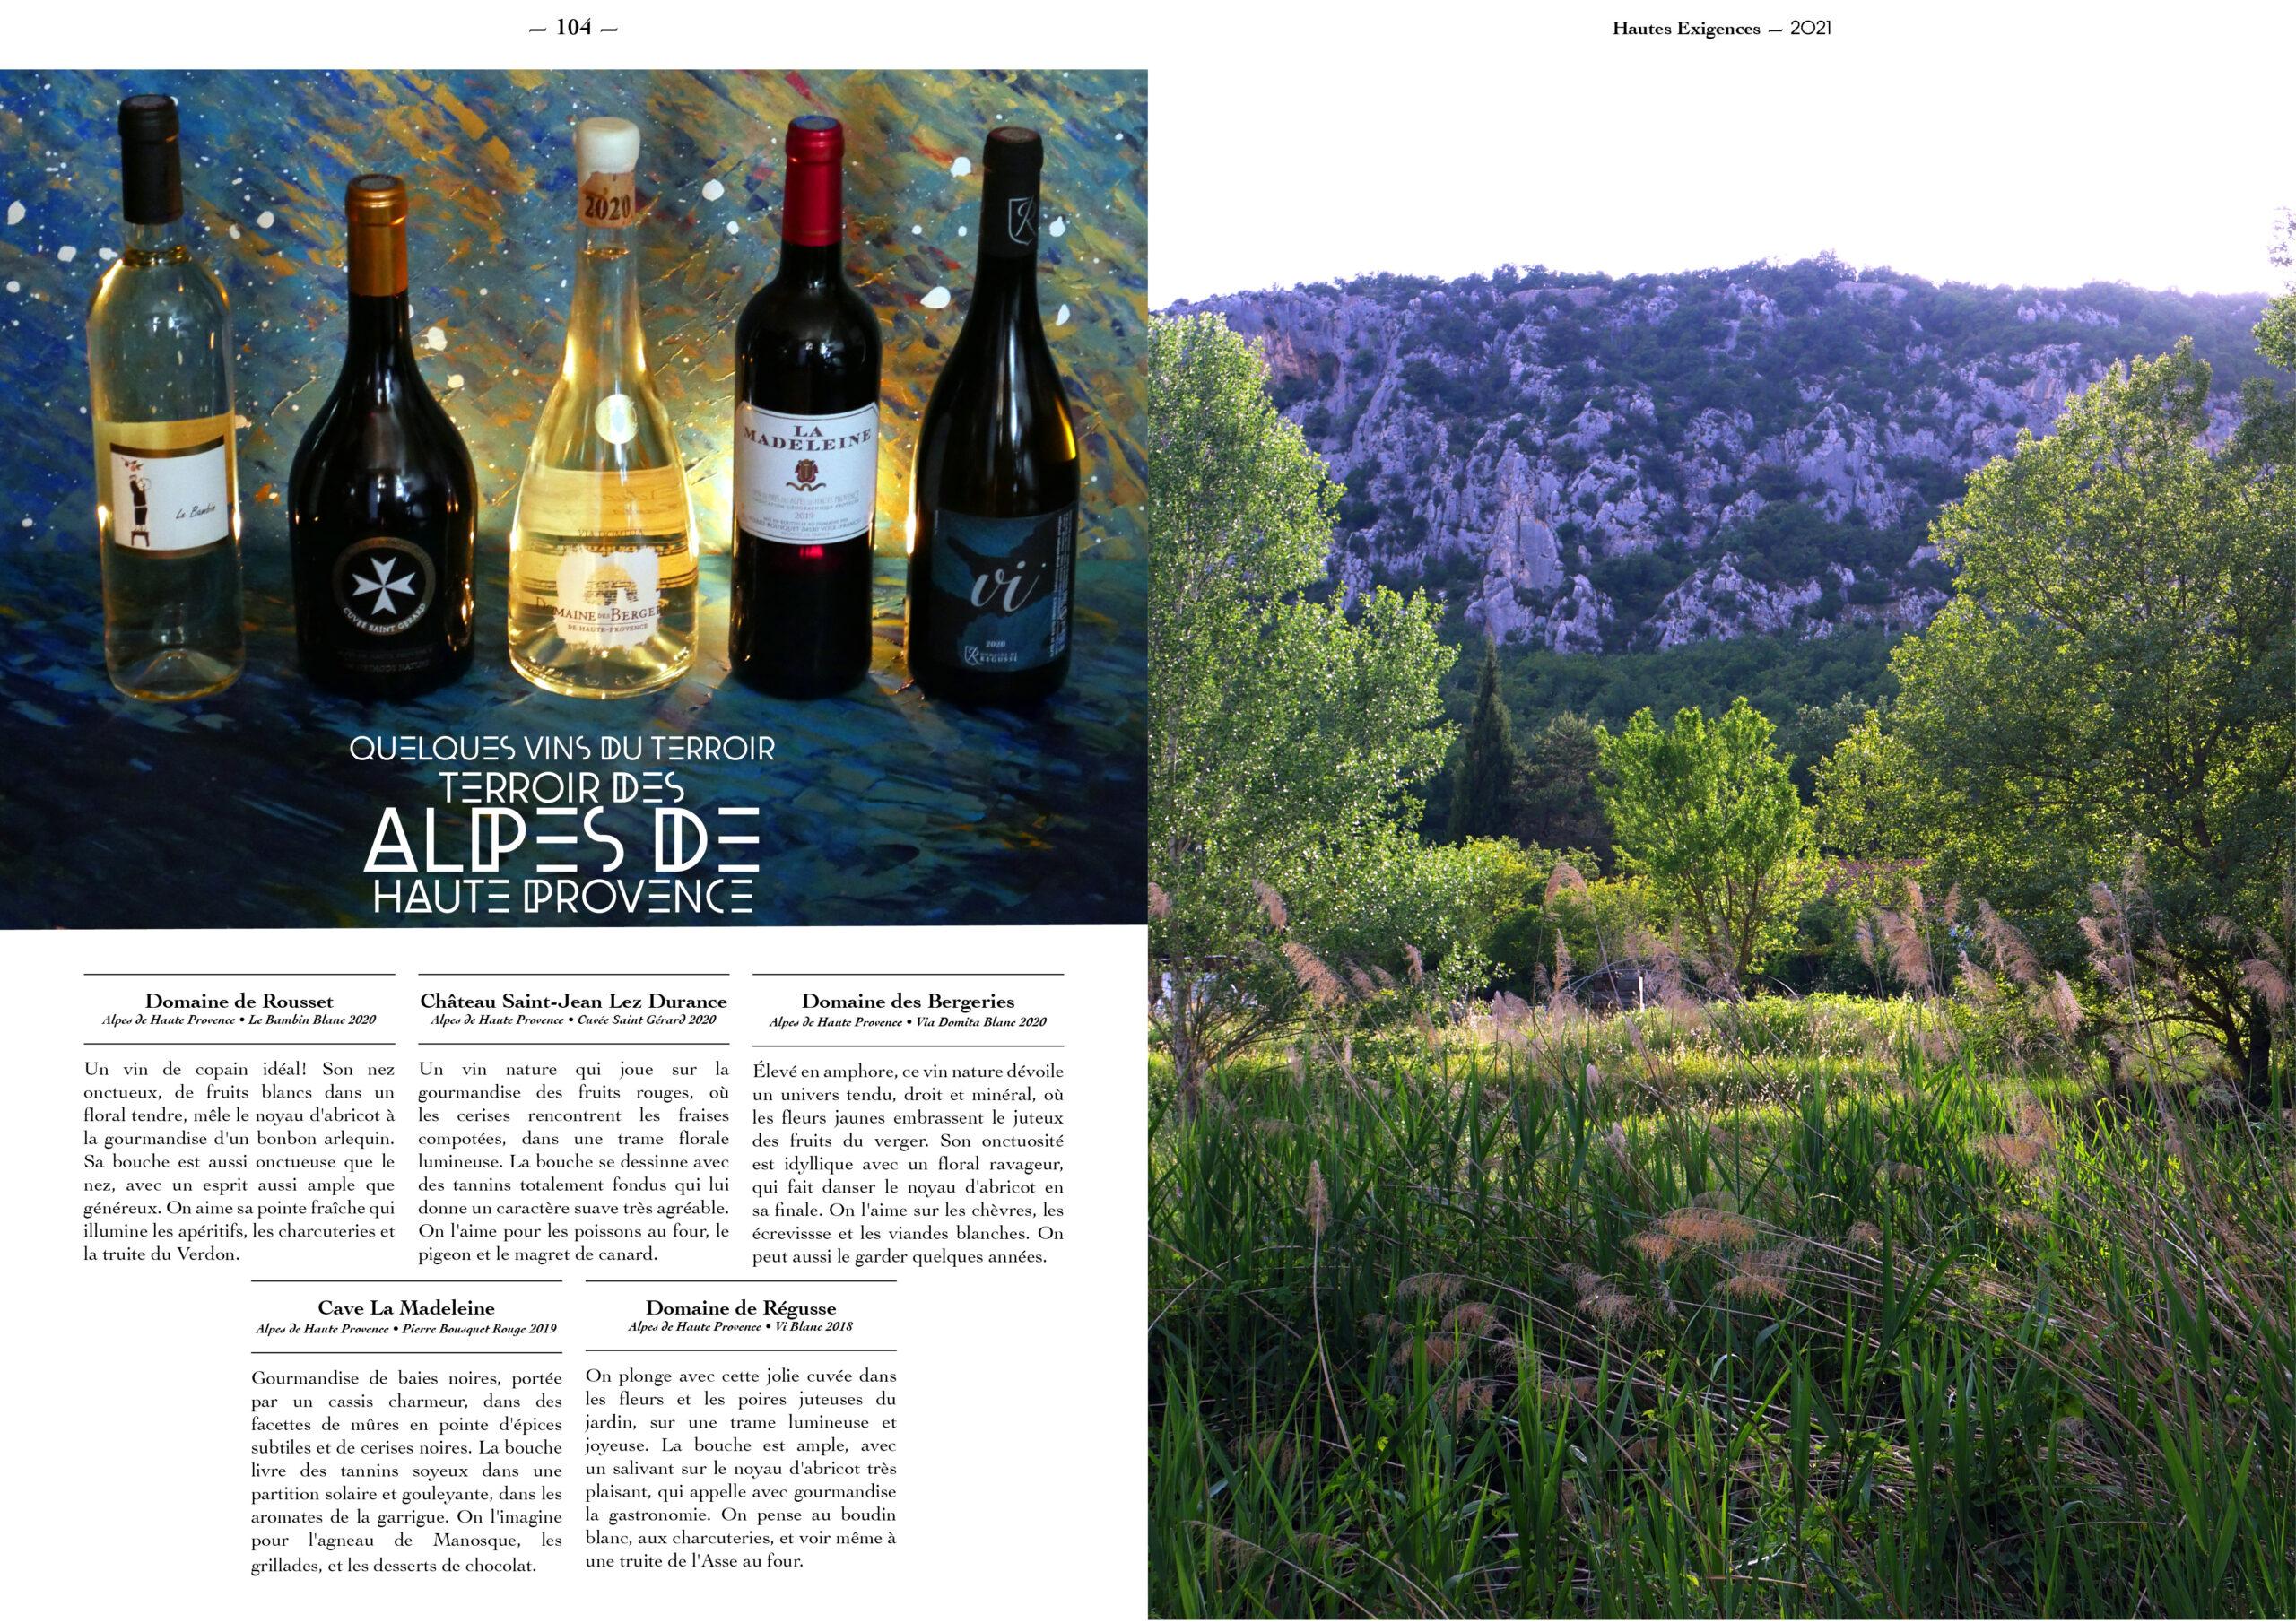 Hautes Exigences Magazine Hors Serie 2021 page 102-103